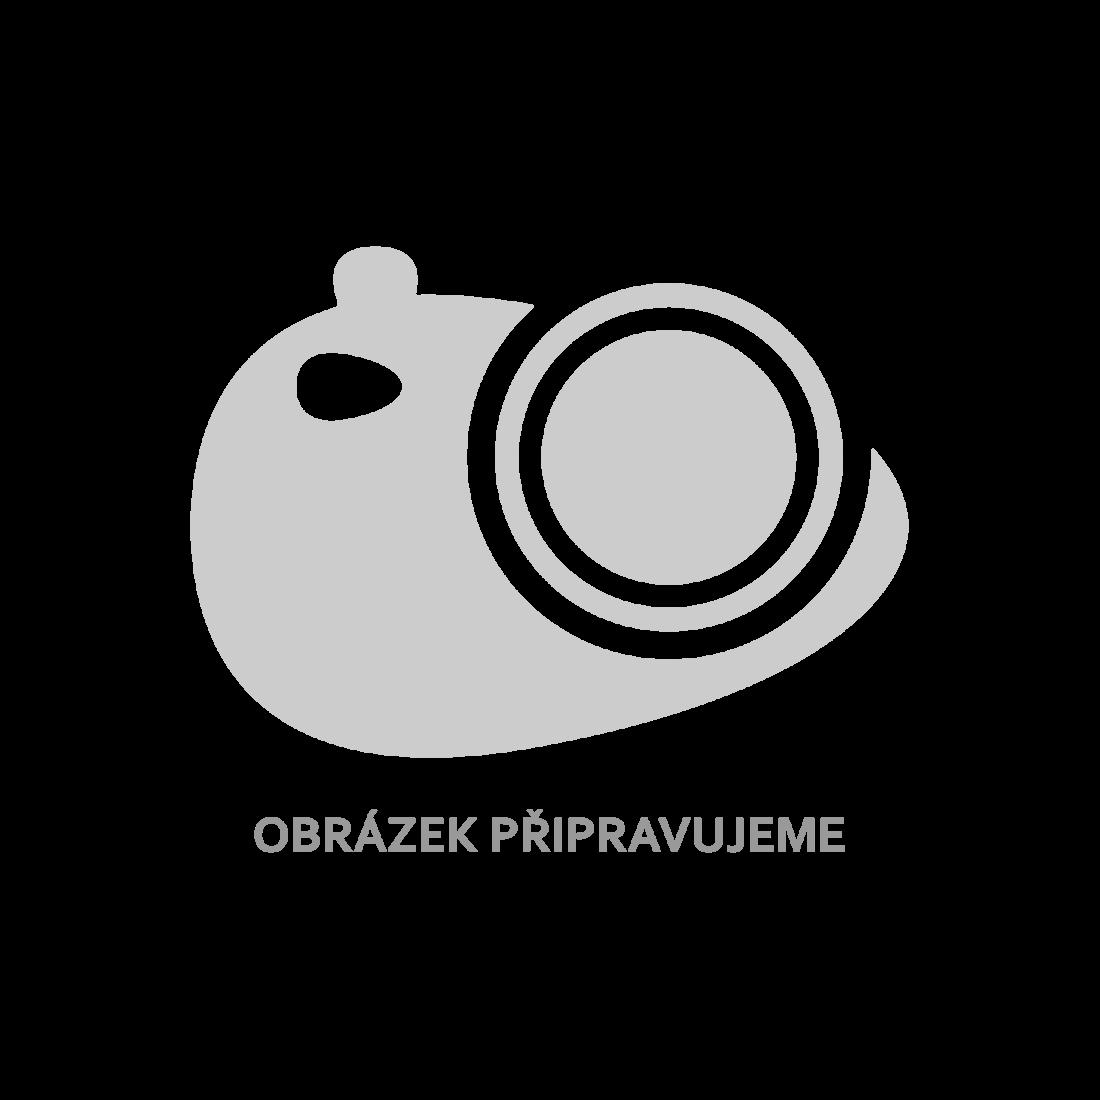 vidaXL Nástěnná police se zásuvkami šedá 88 x 26 x 18,5 cm dřevotříska [800598]